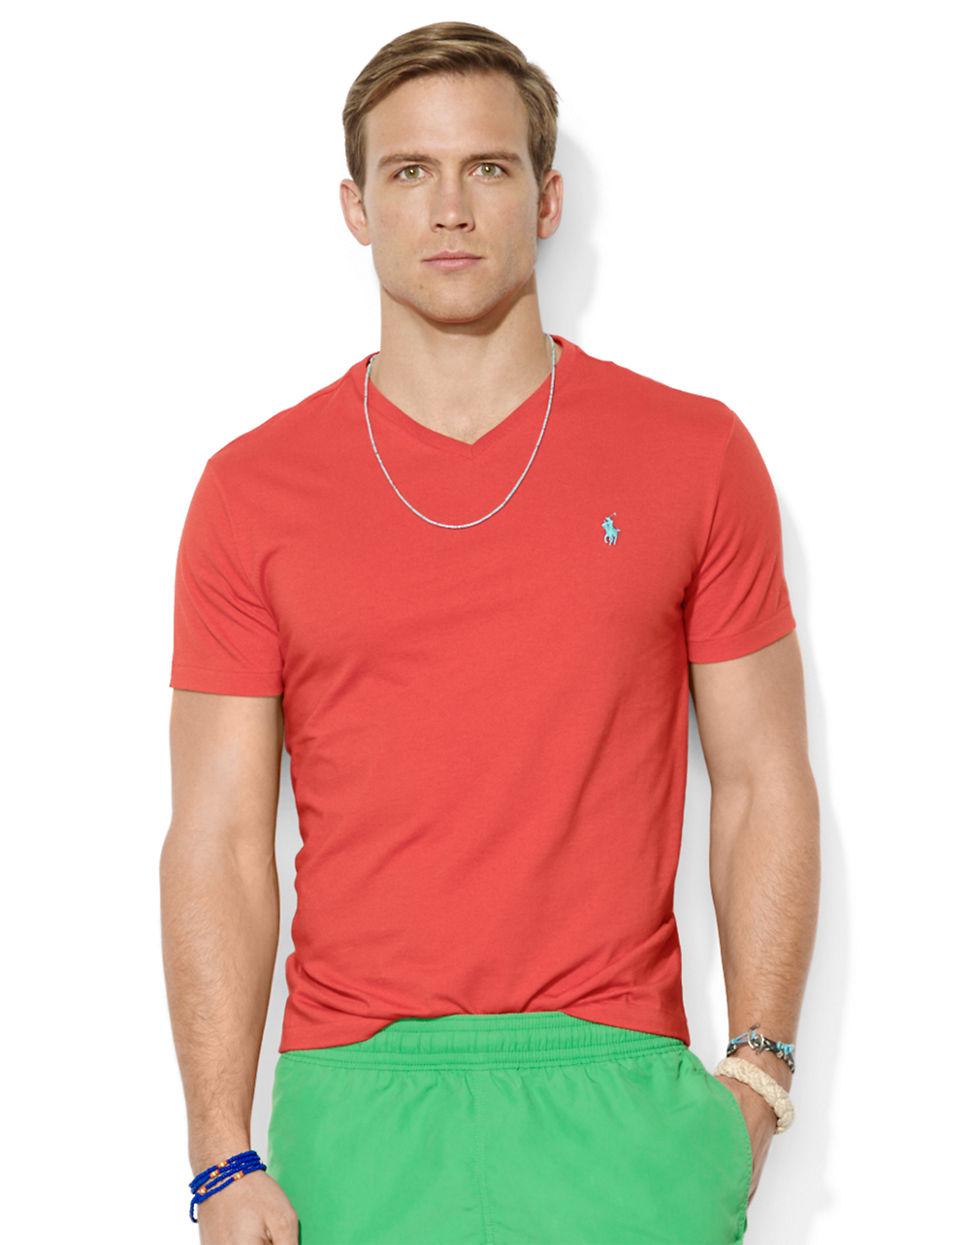 polo ralph lauren jersey v neck t shirt in red for men lyst. Black Bedroom Furniture Sets. Home Design Ideas